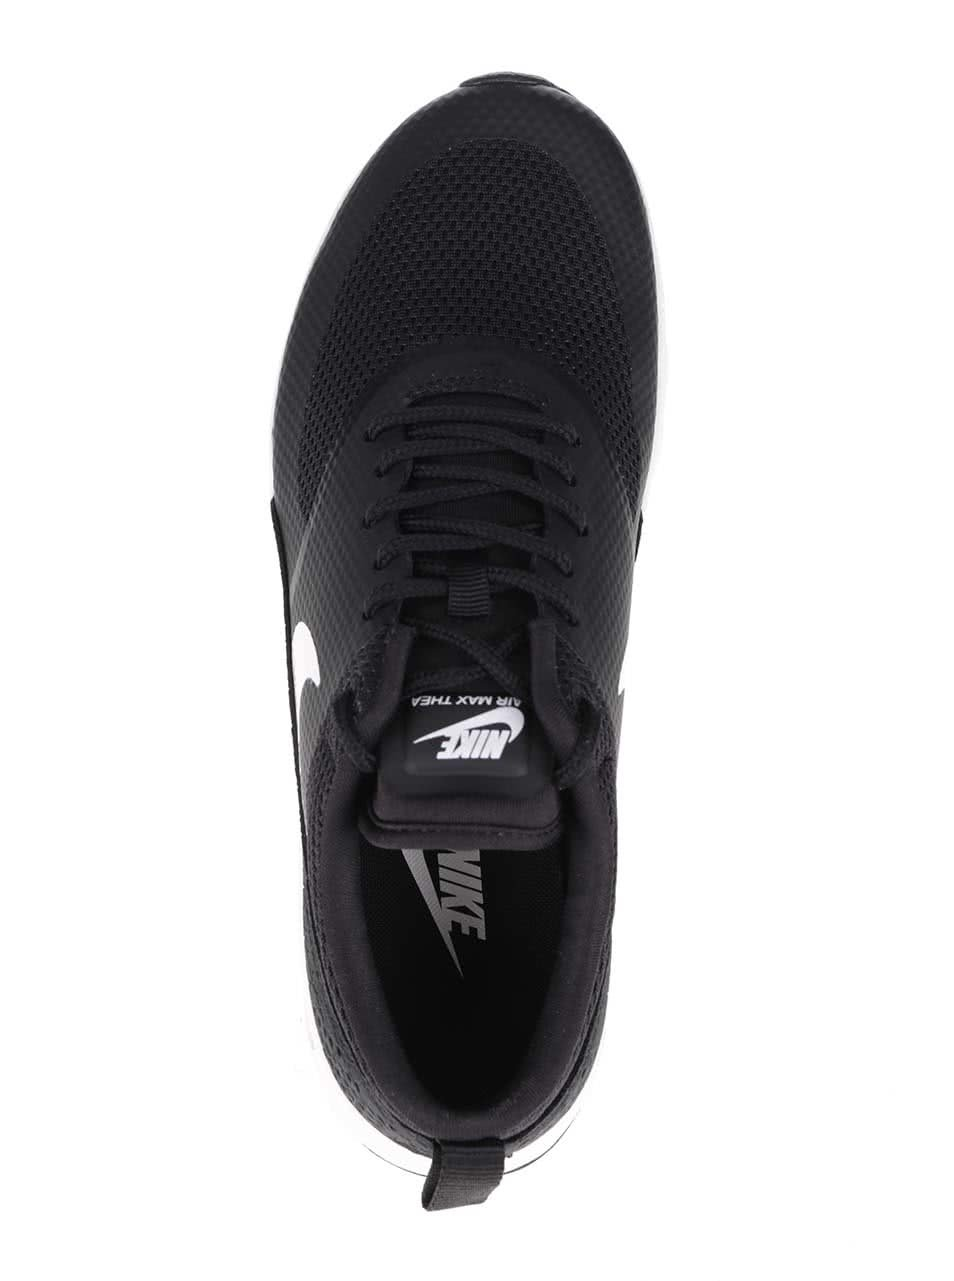 Černé dámské tenisky Nike Air Max Thea ... 18e452e1c13